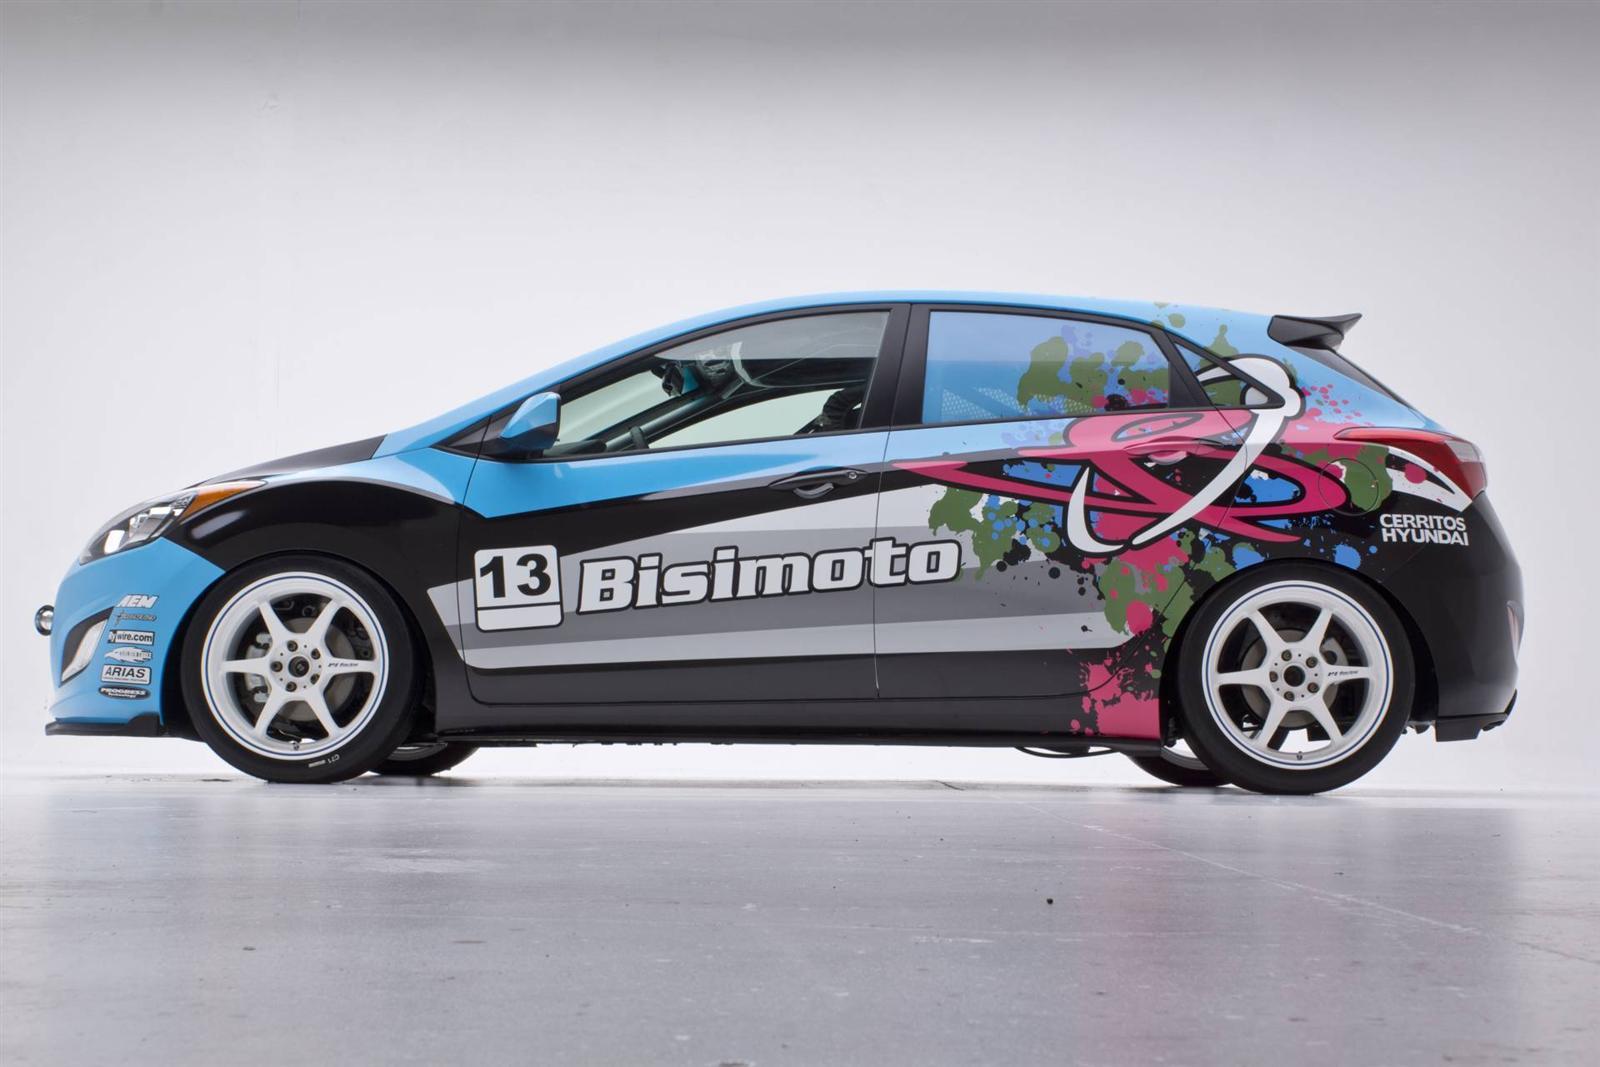 2012 Hyundai Bisimoto Elantra Gt Concept News And Information Fuel Filter Research Pricing